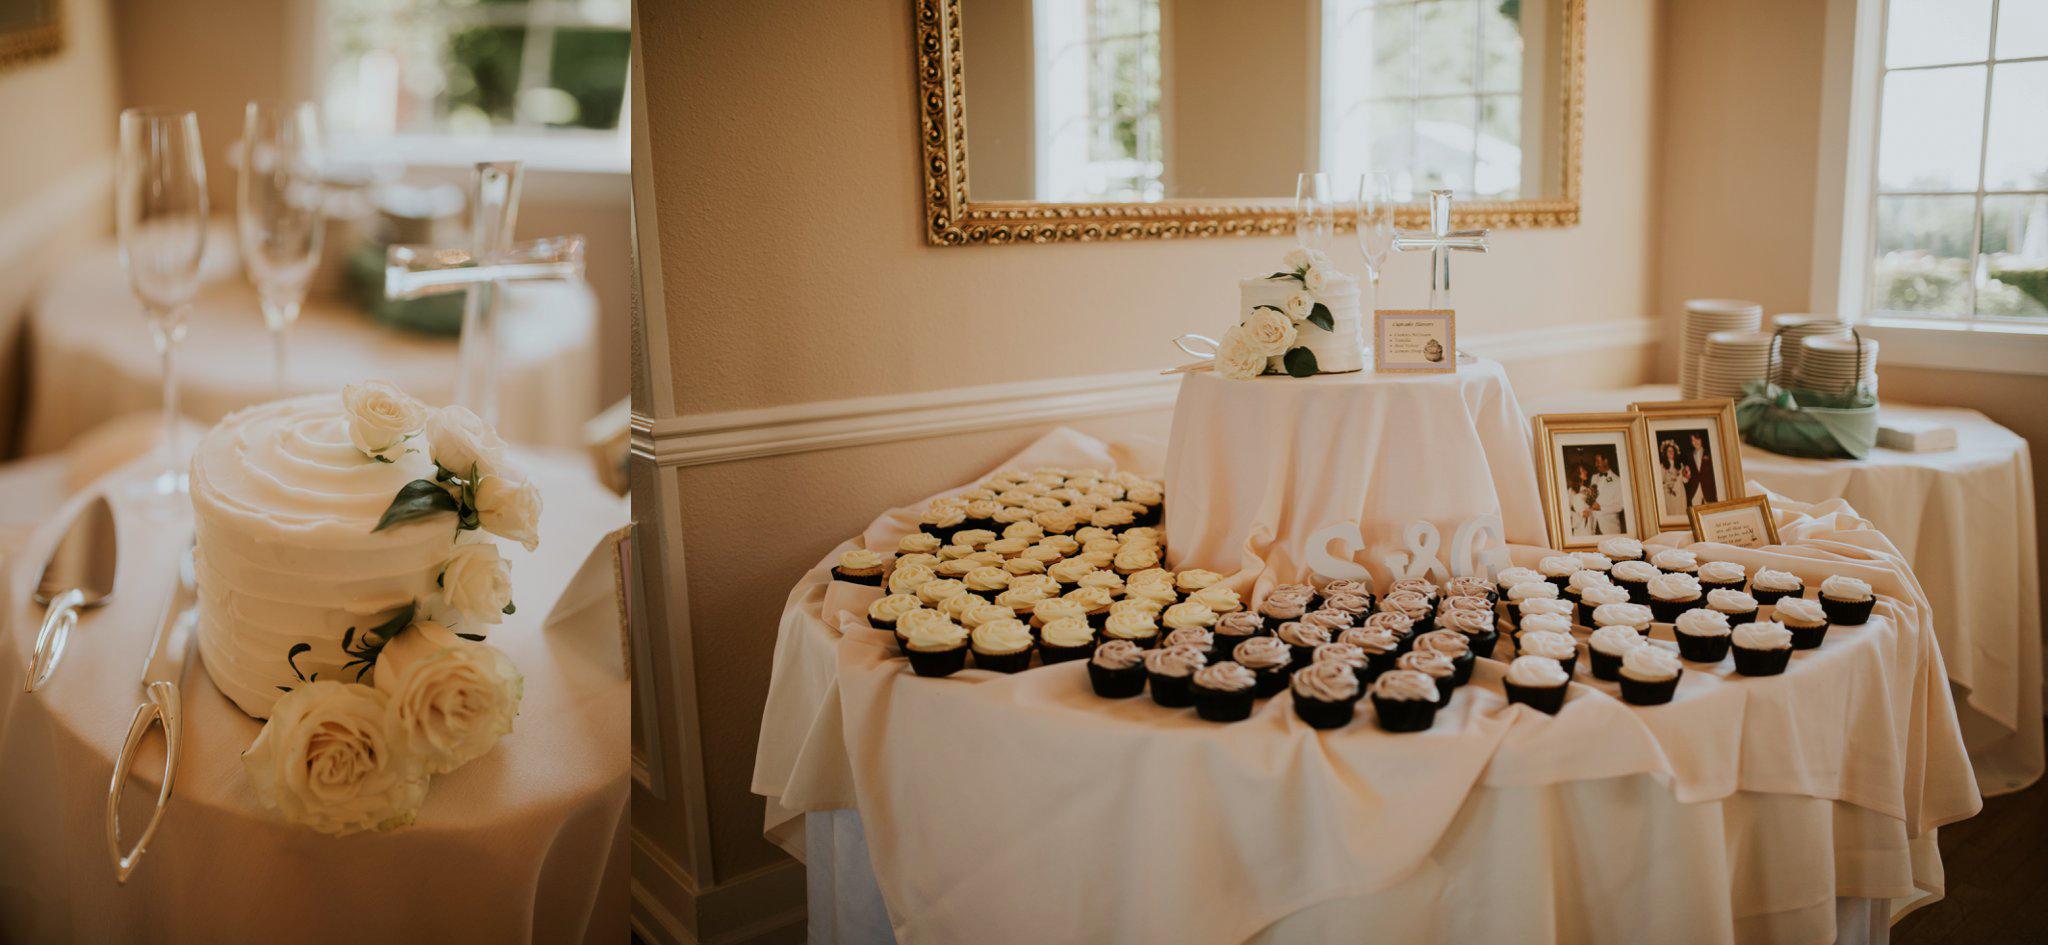 hollywood-school-house-wedding-seattle-photographer-caitlyn-nikula-89.jpg